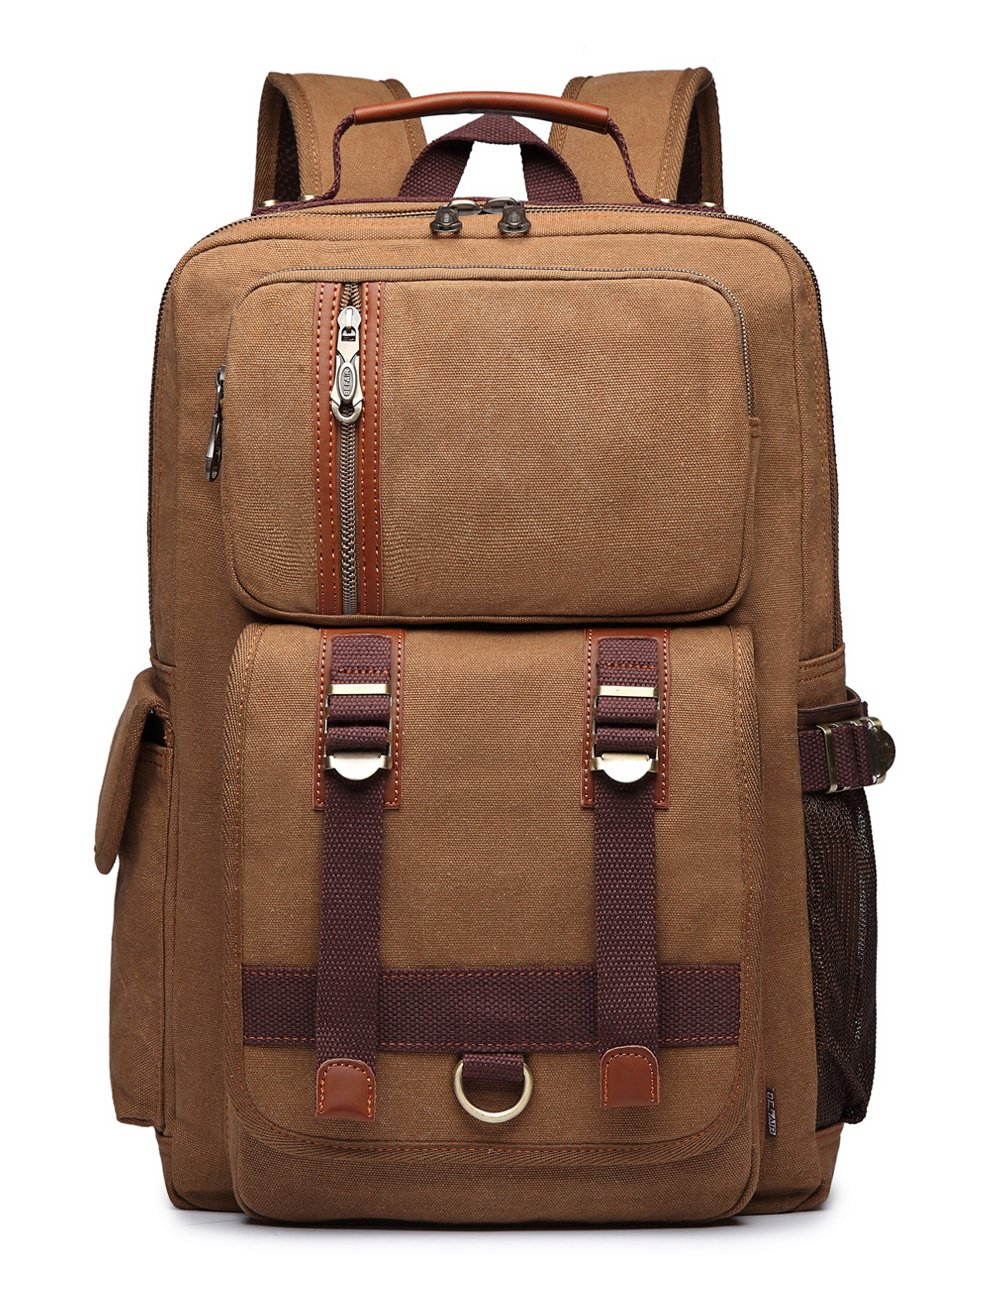 BEFAiR Unisex Middle Student Backpack Vintage Canvas Rucksack Travel Hiking Daypack Coffee